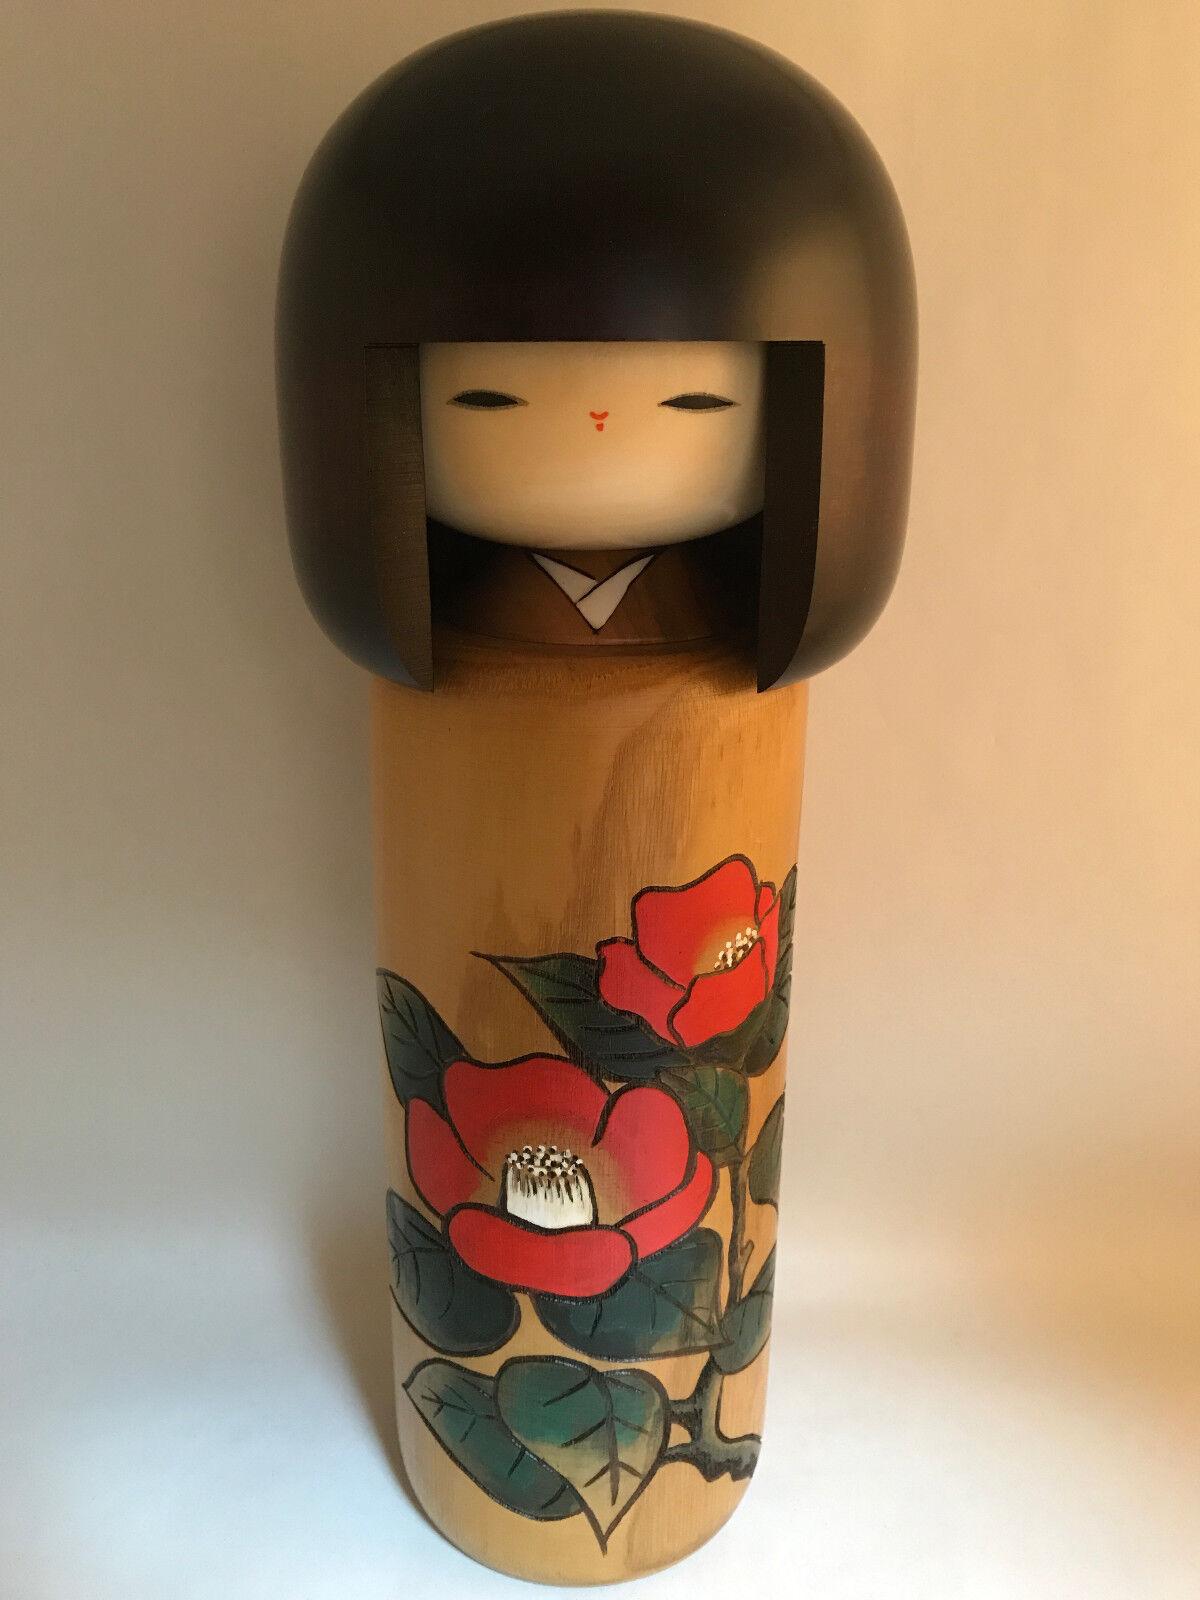 30cm Usaburo Japanese Kokeshi Doll - Made Made Made in Japan - Handmade Wooden Dolls  Entrega directa y rápida de fábrica